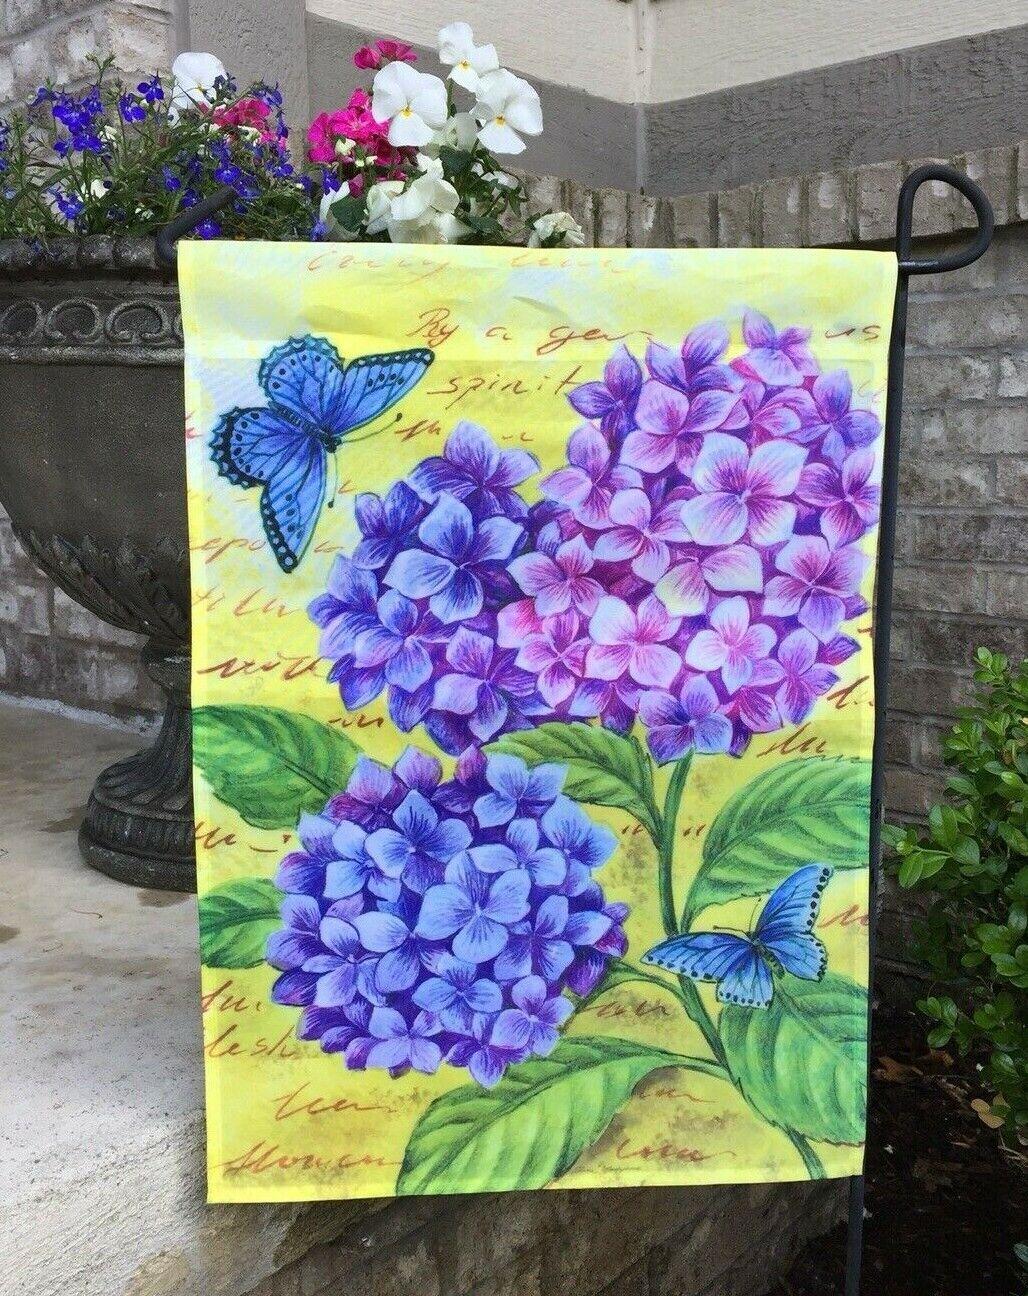 Evergreen Decorative Double-sided Garden Flag- Blue Hydrange